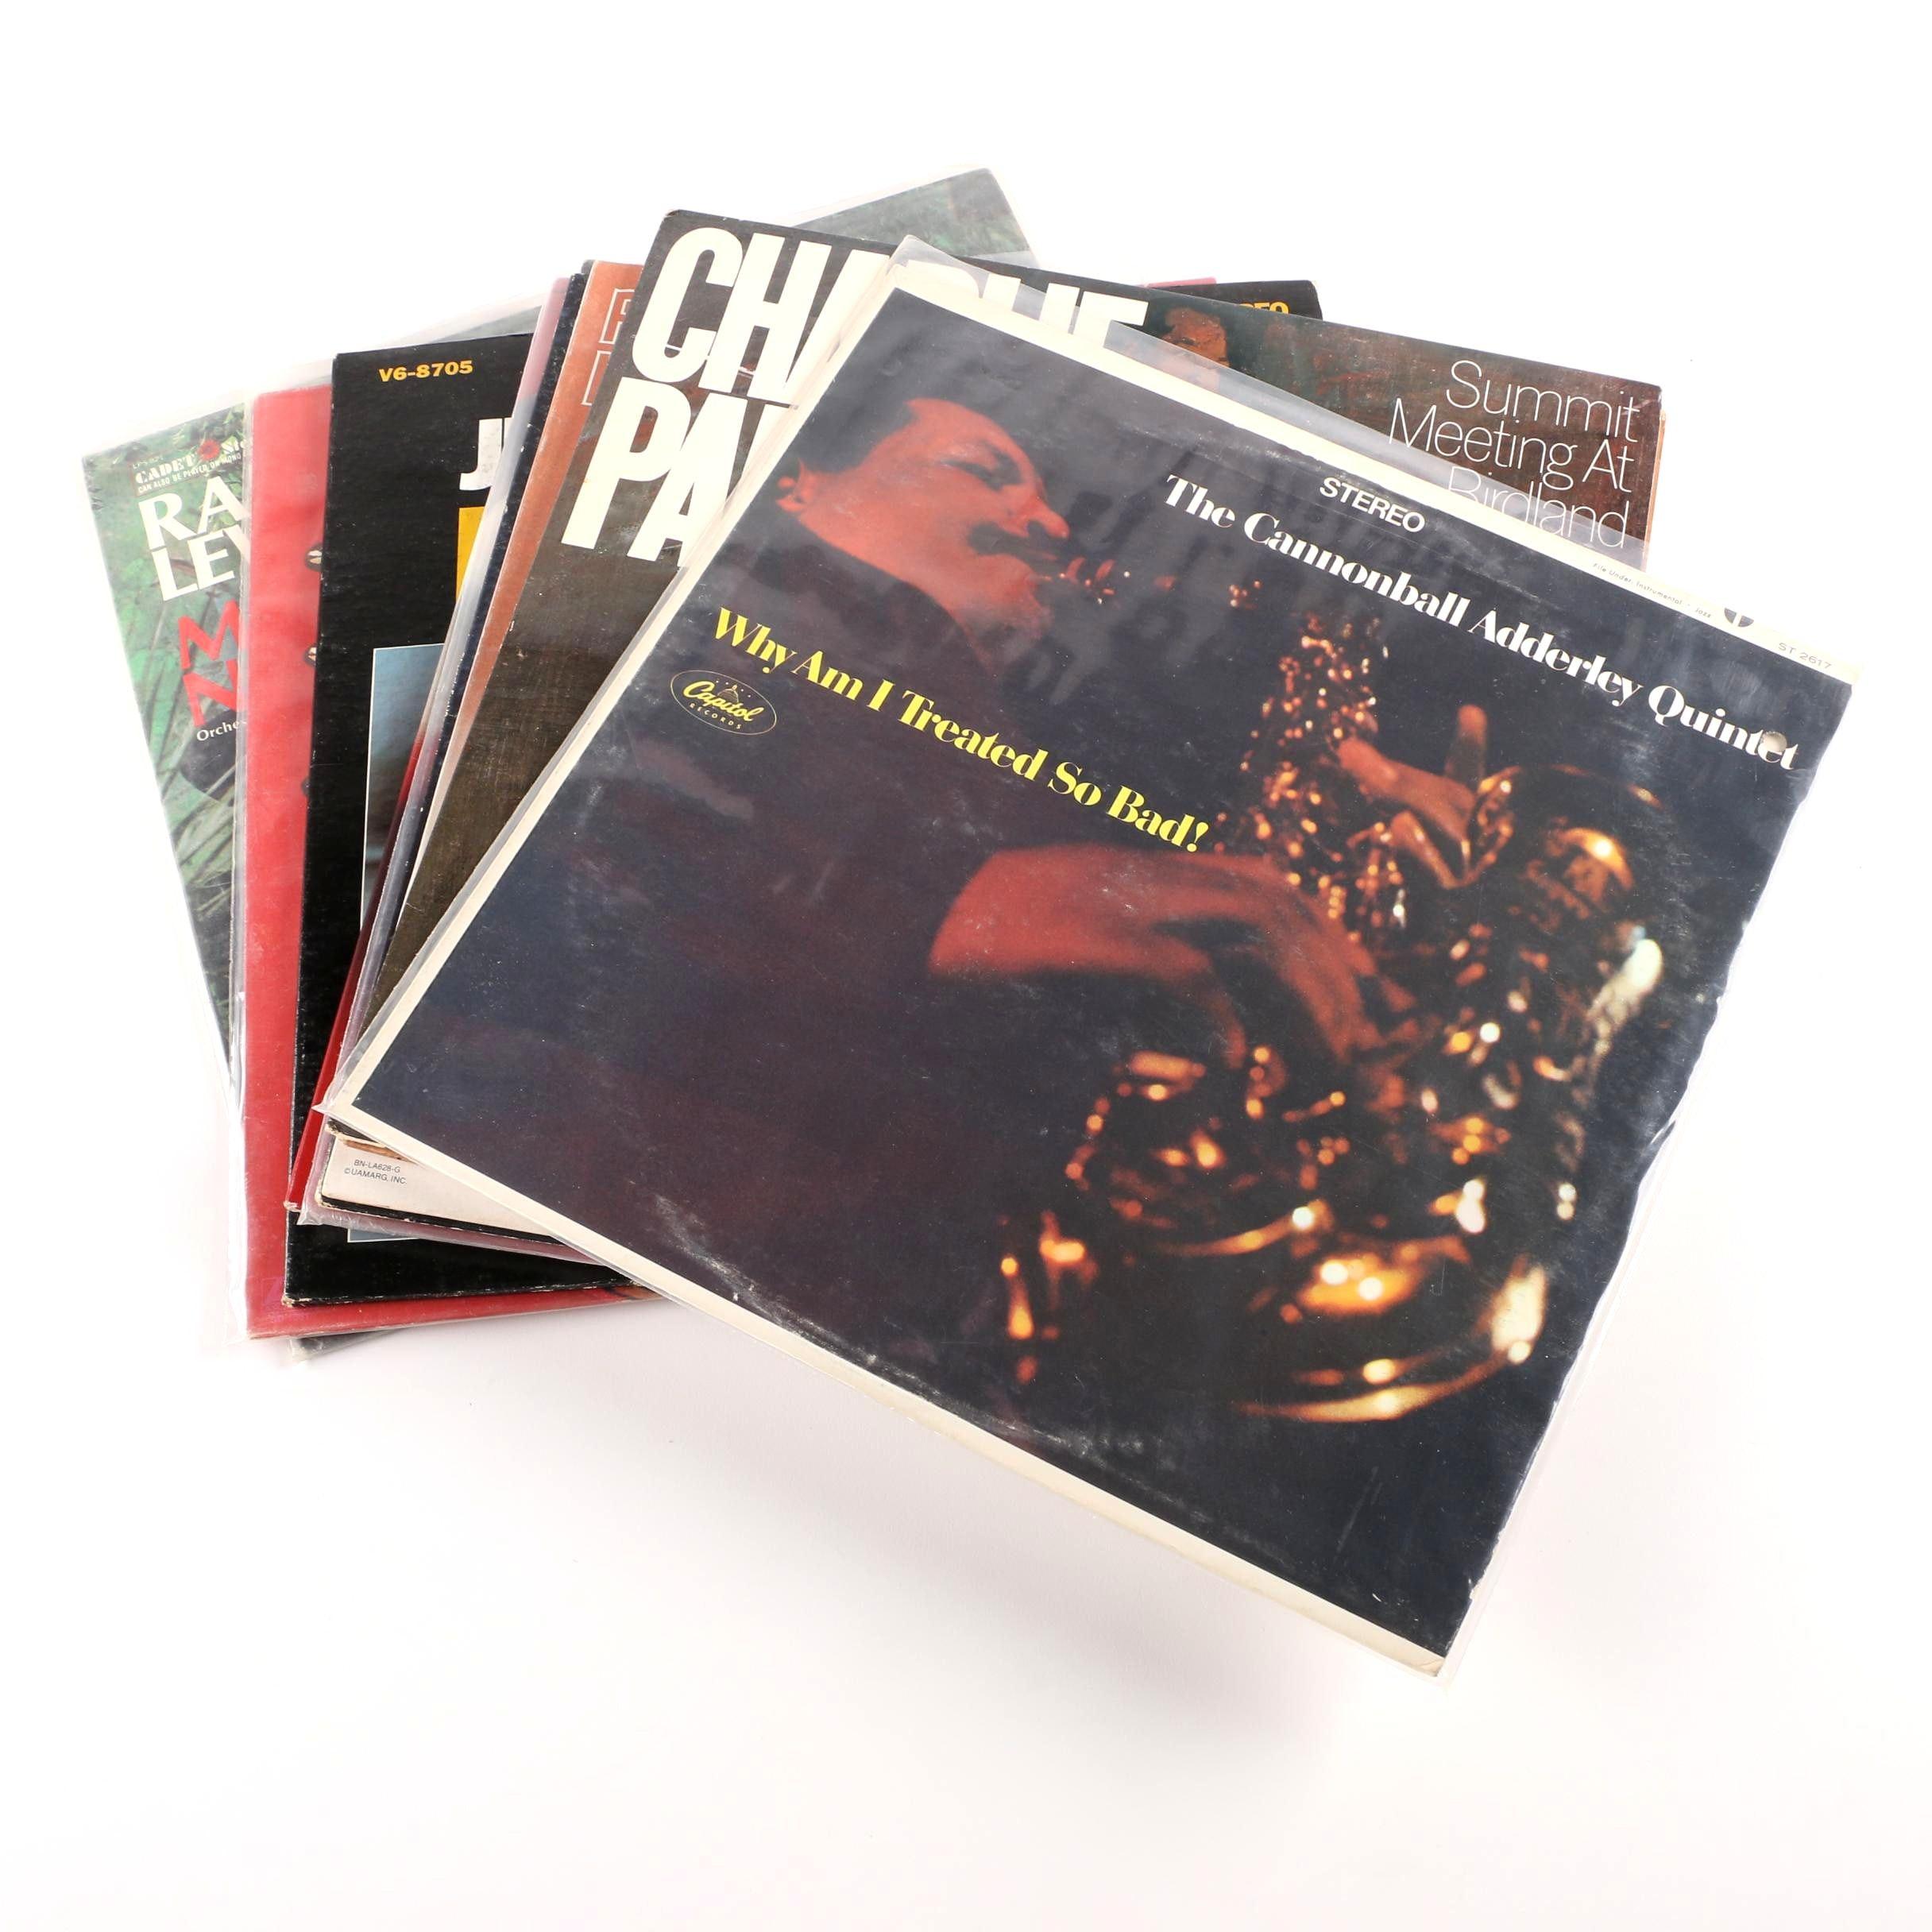 Jazz Records Including Charlie Parker, Dave Brubeck, Cannonball Adderley